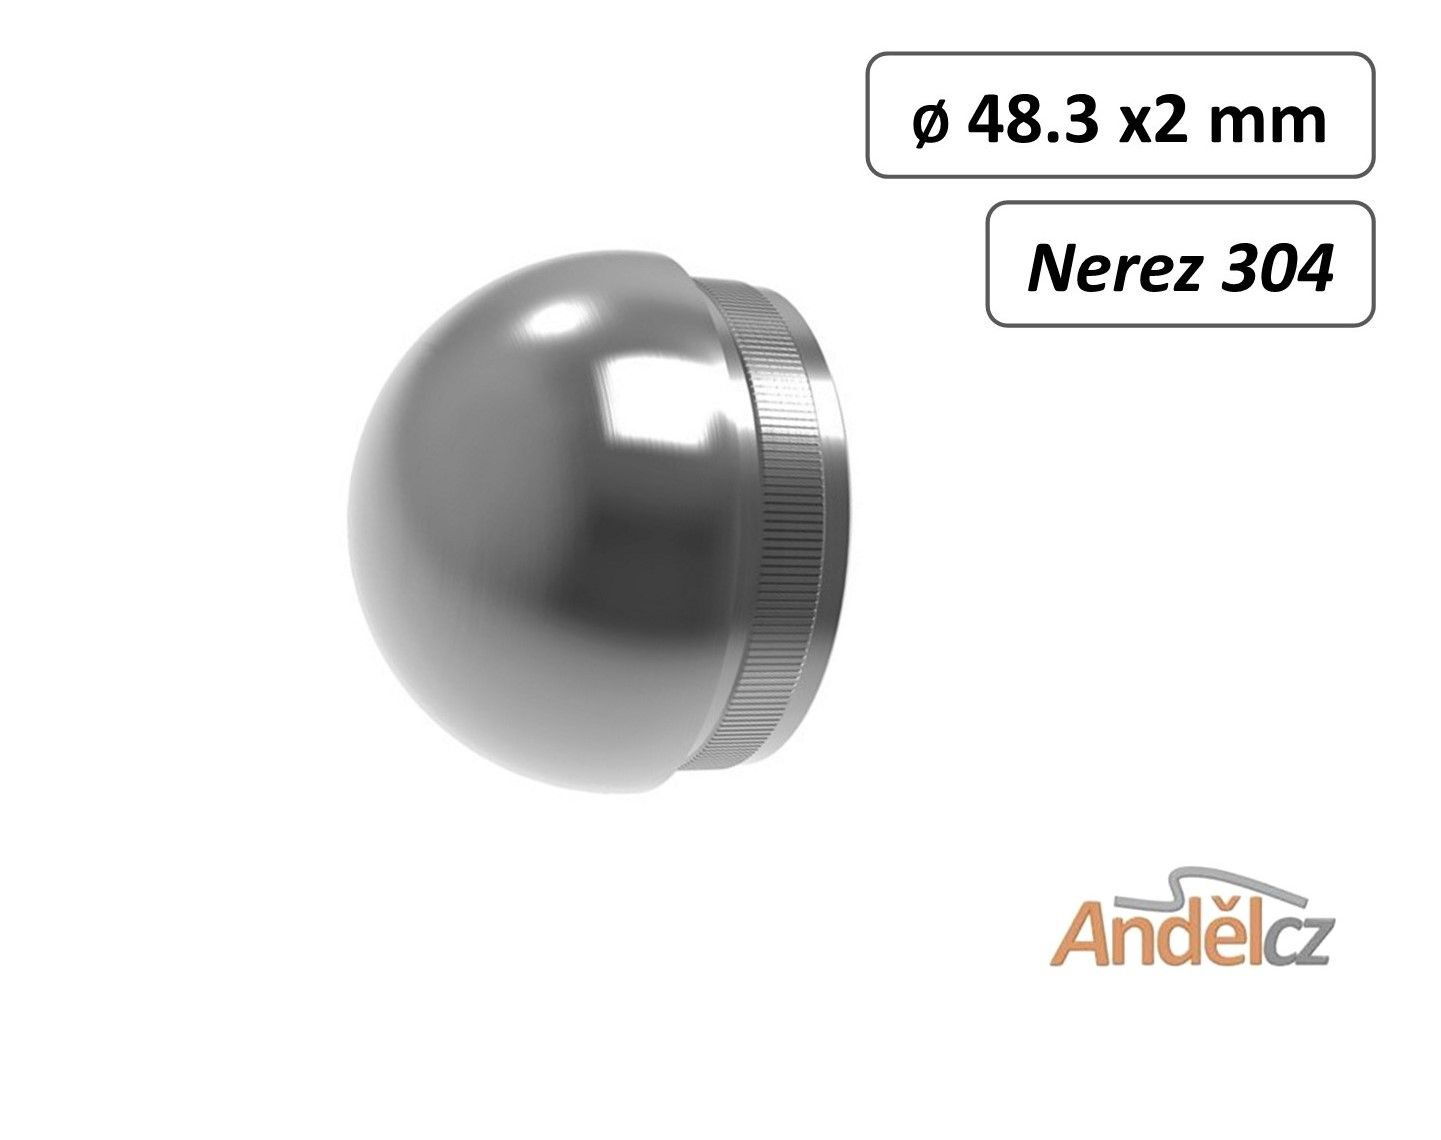 Koncovka madla půlkulatá 48,3mm